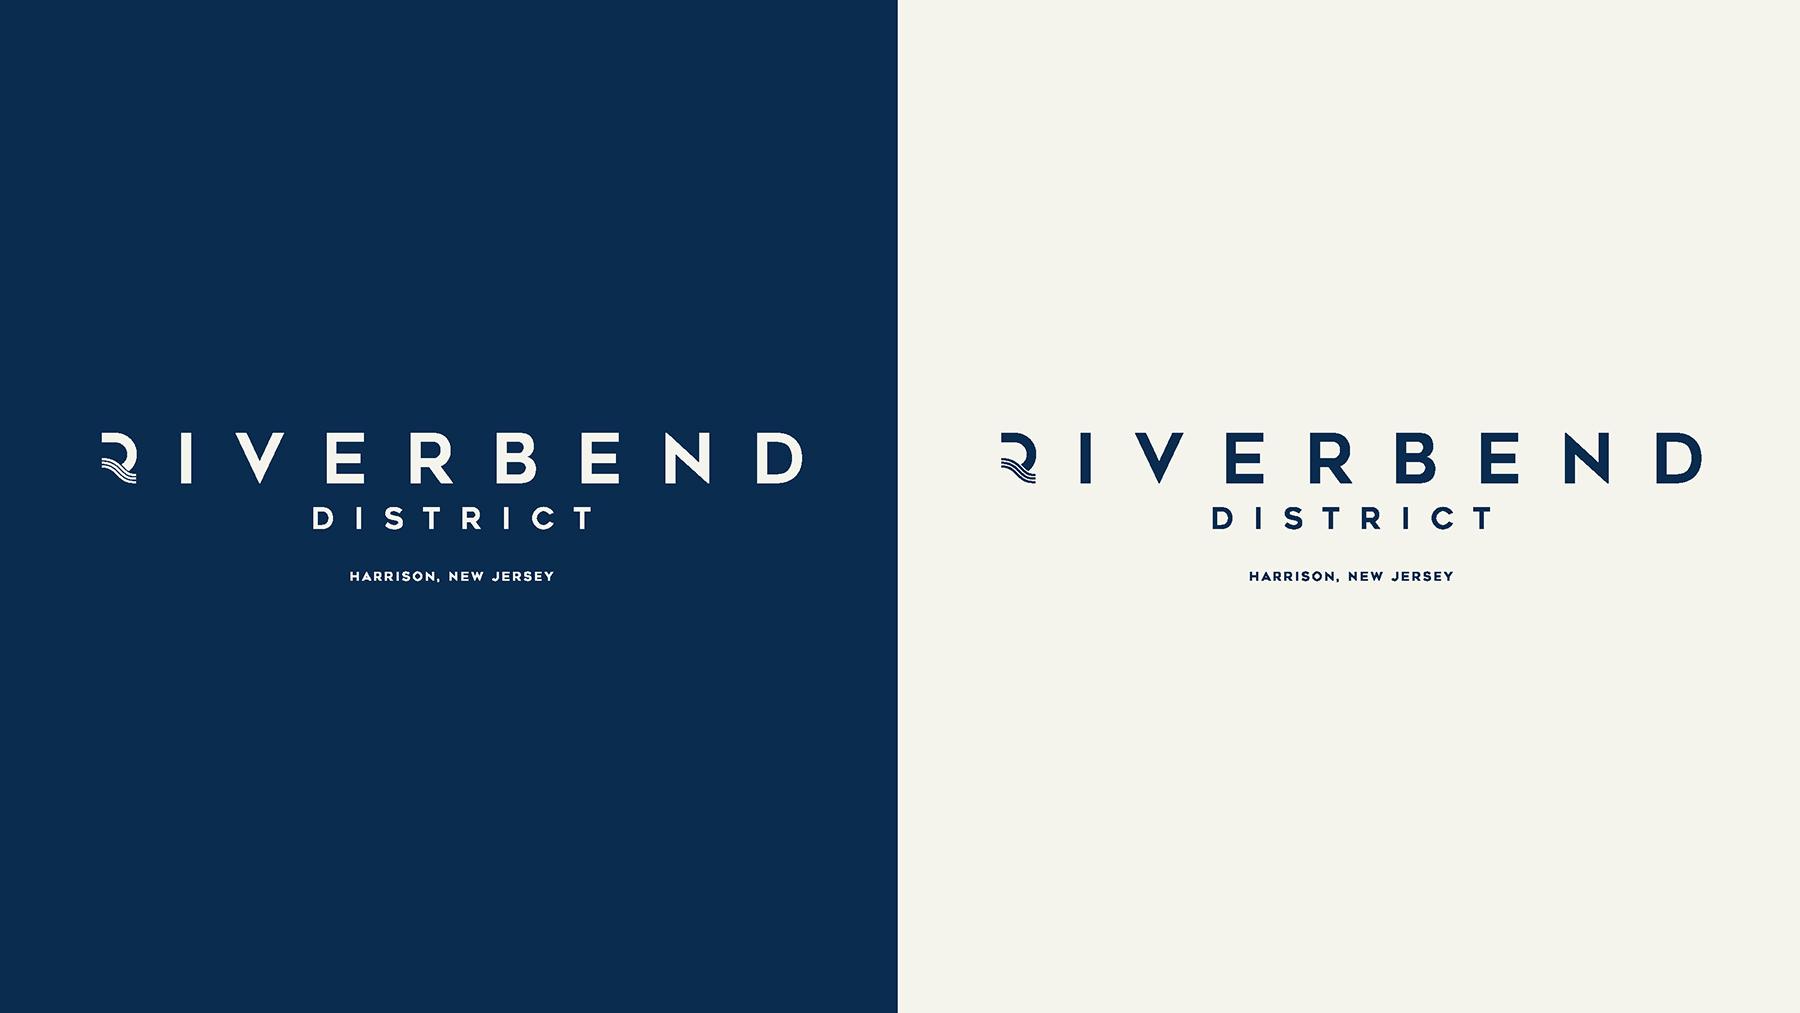 WRK-Riverbend_Page_1